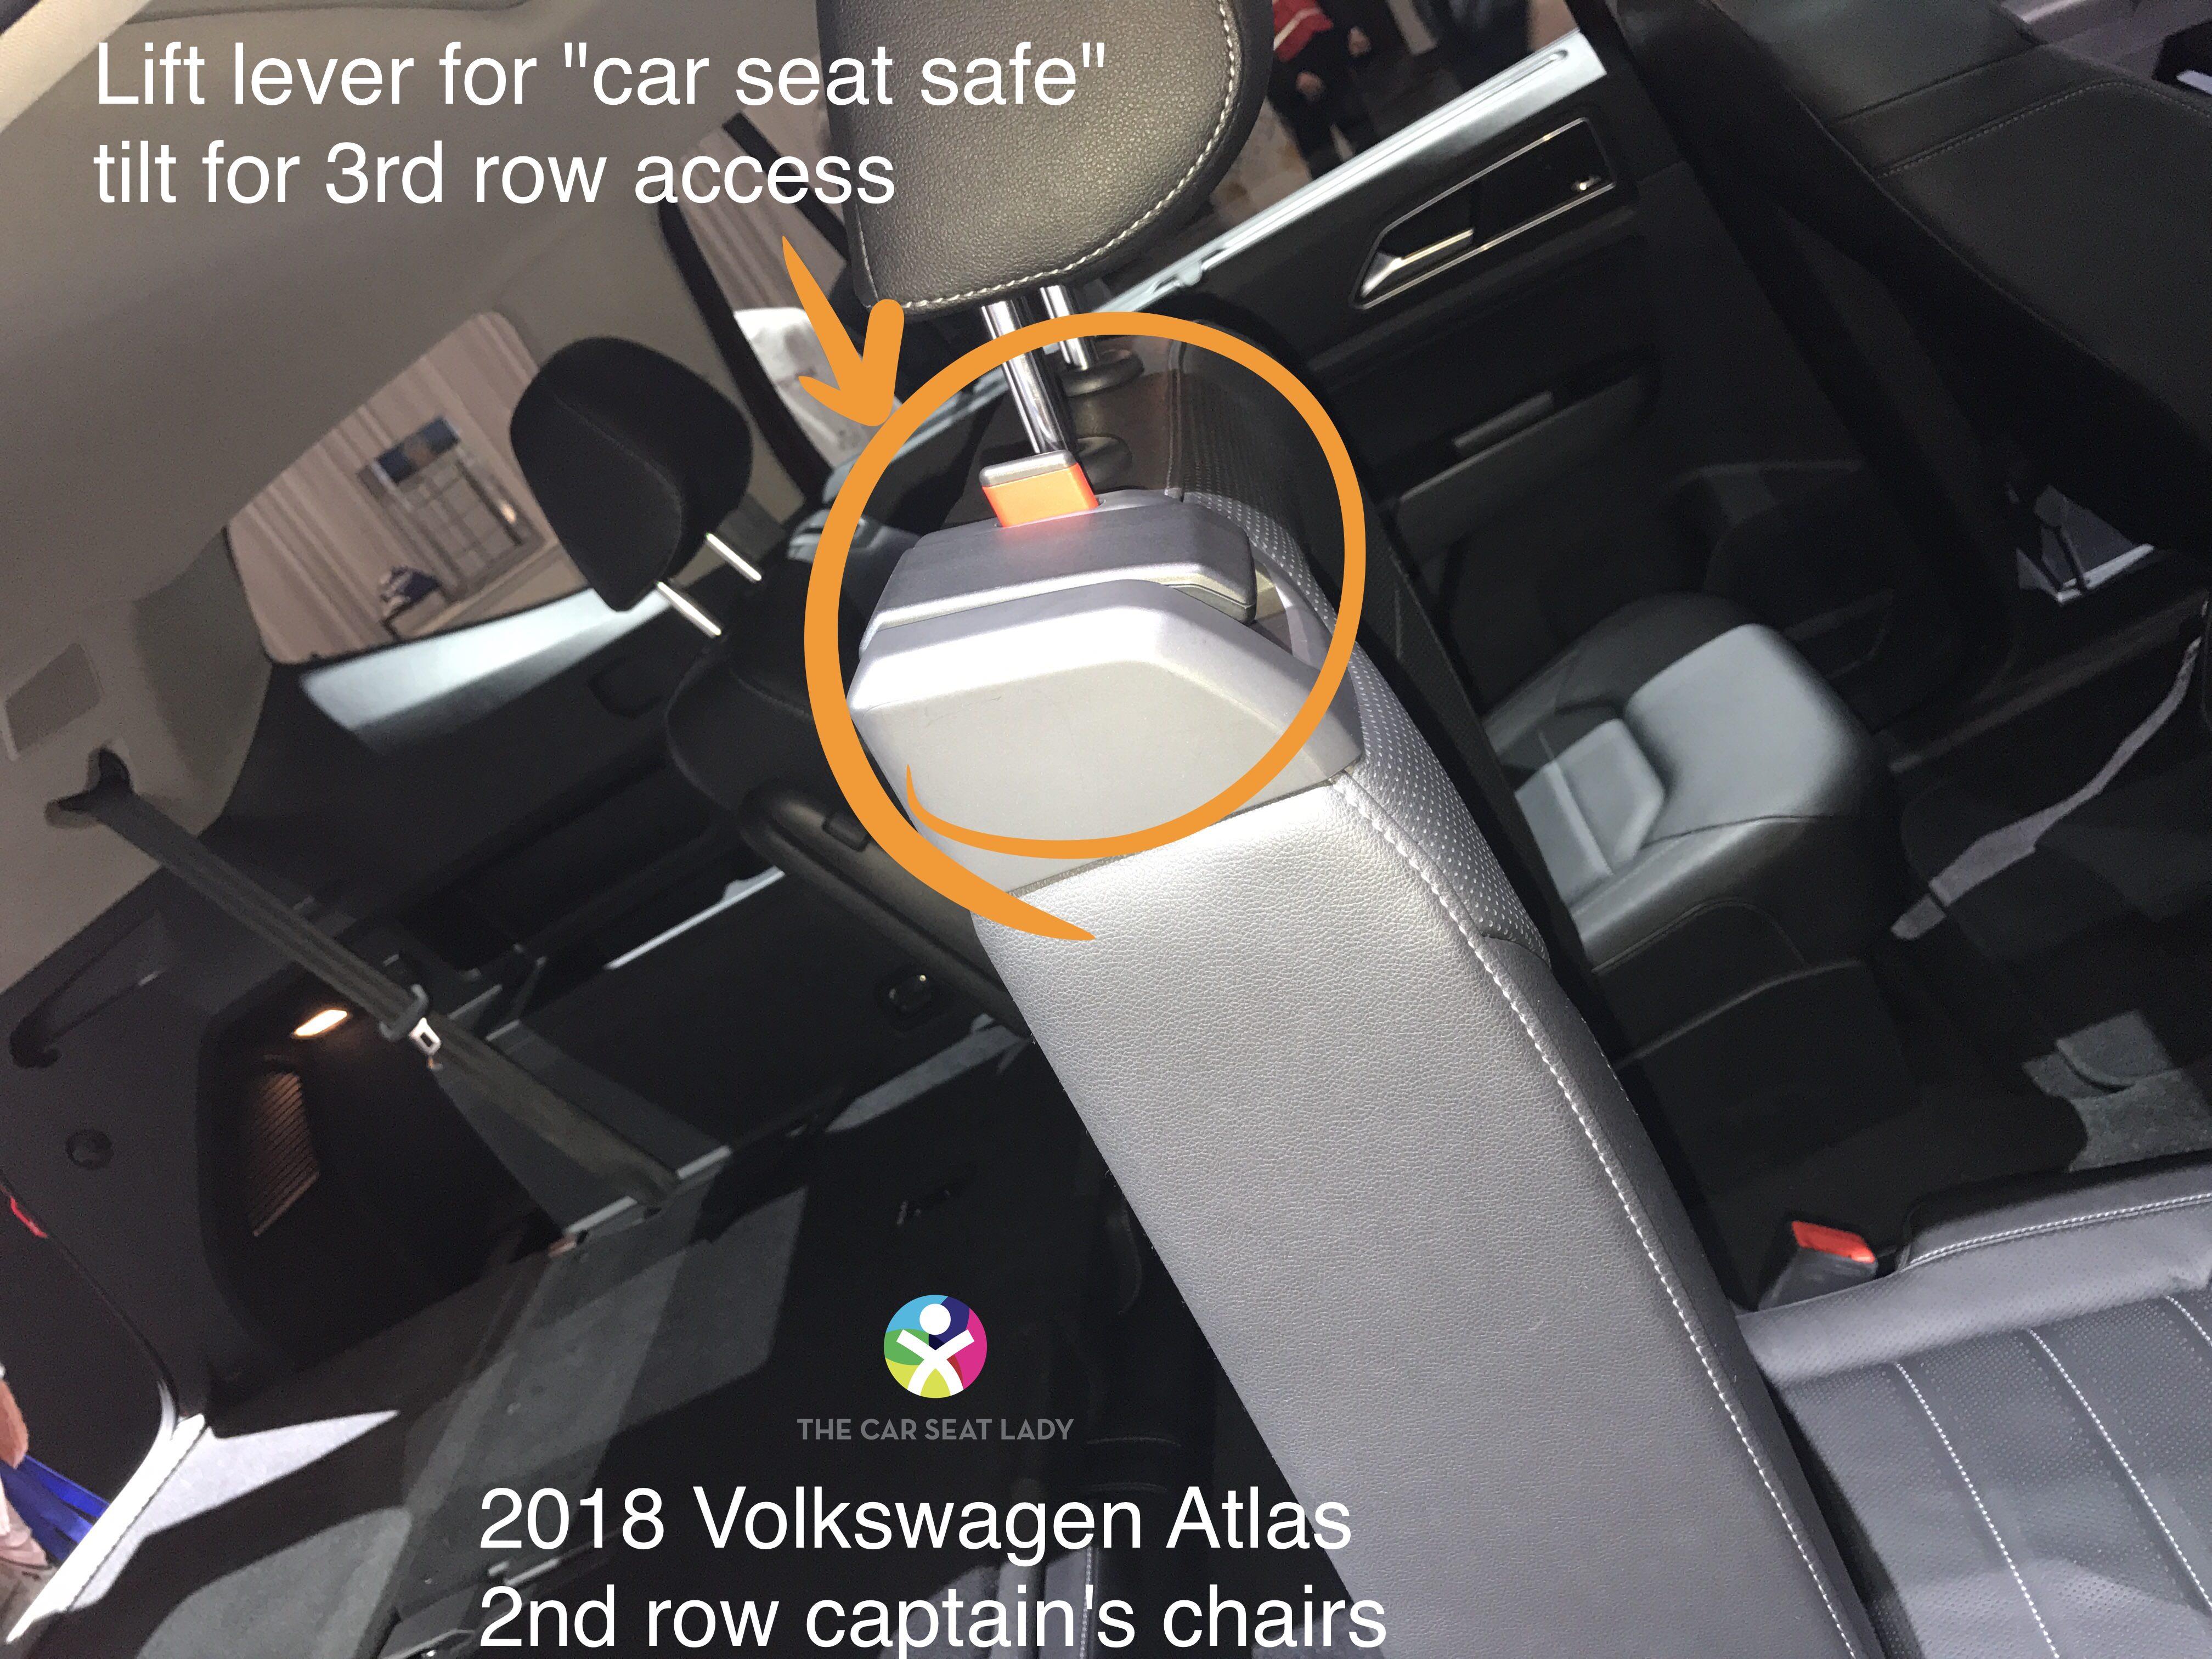 The Car Seat Lady Volkswagen Atlas